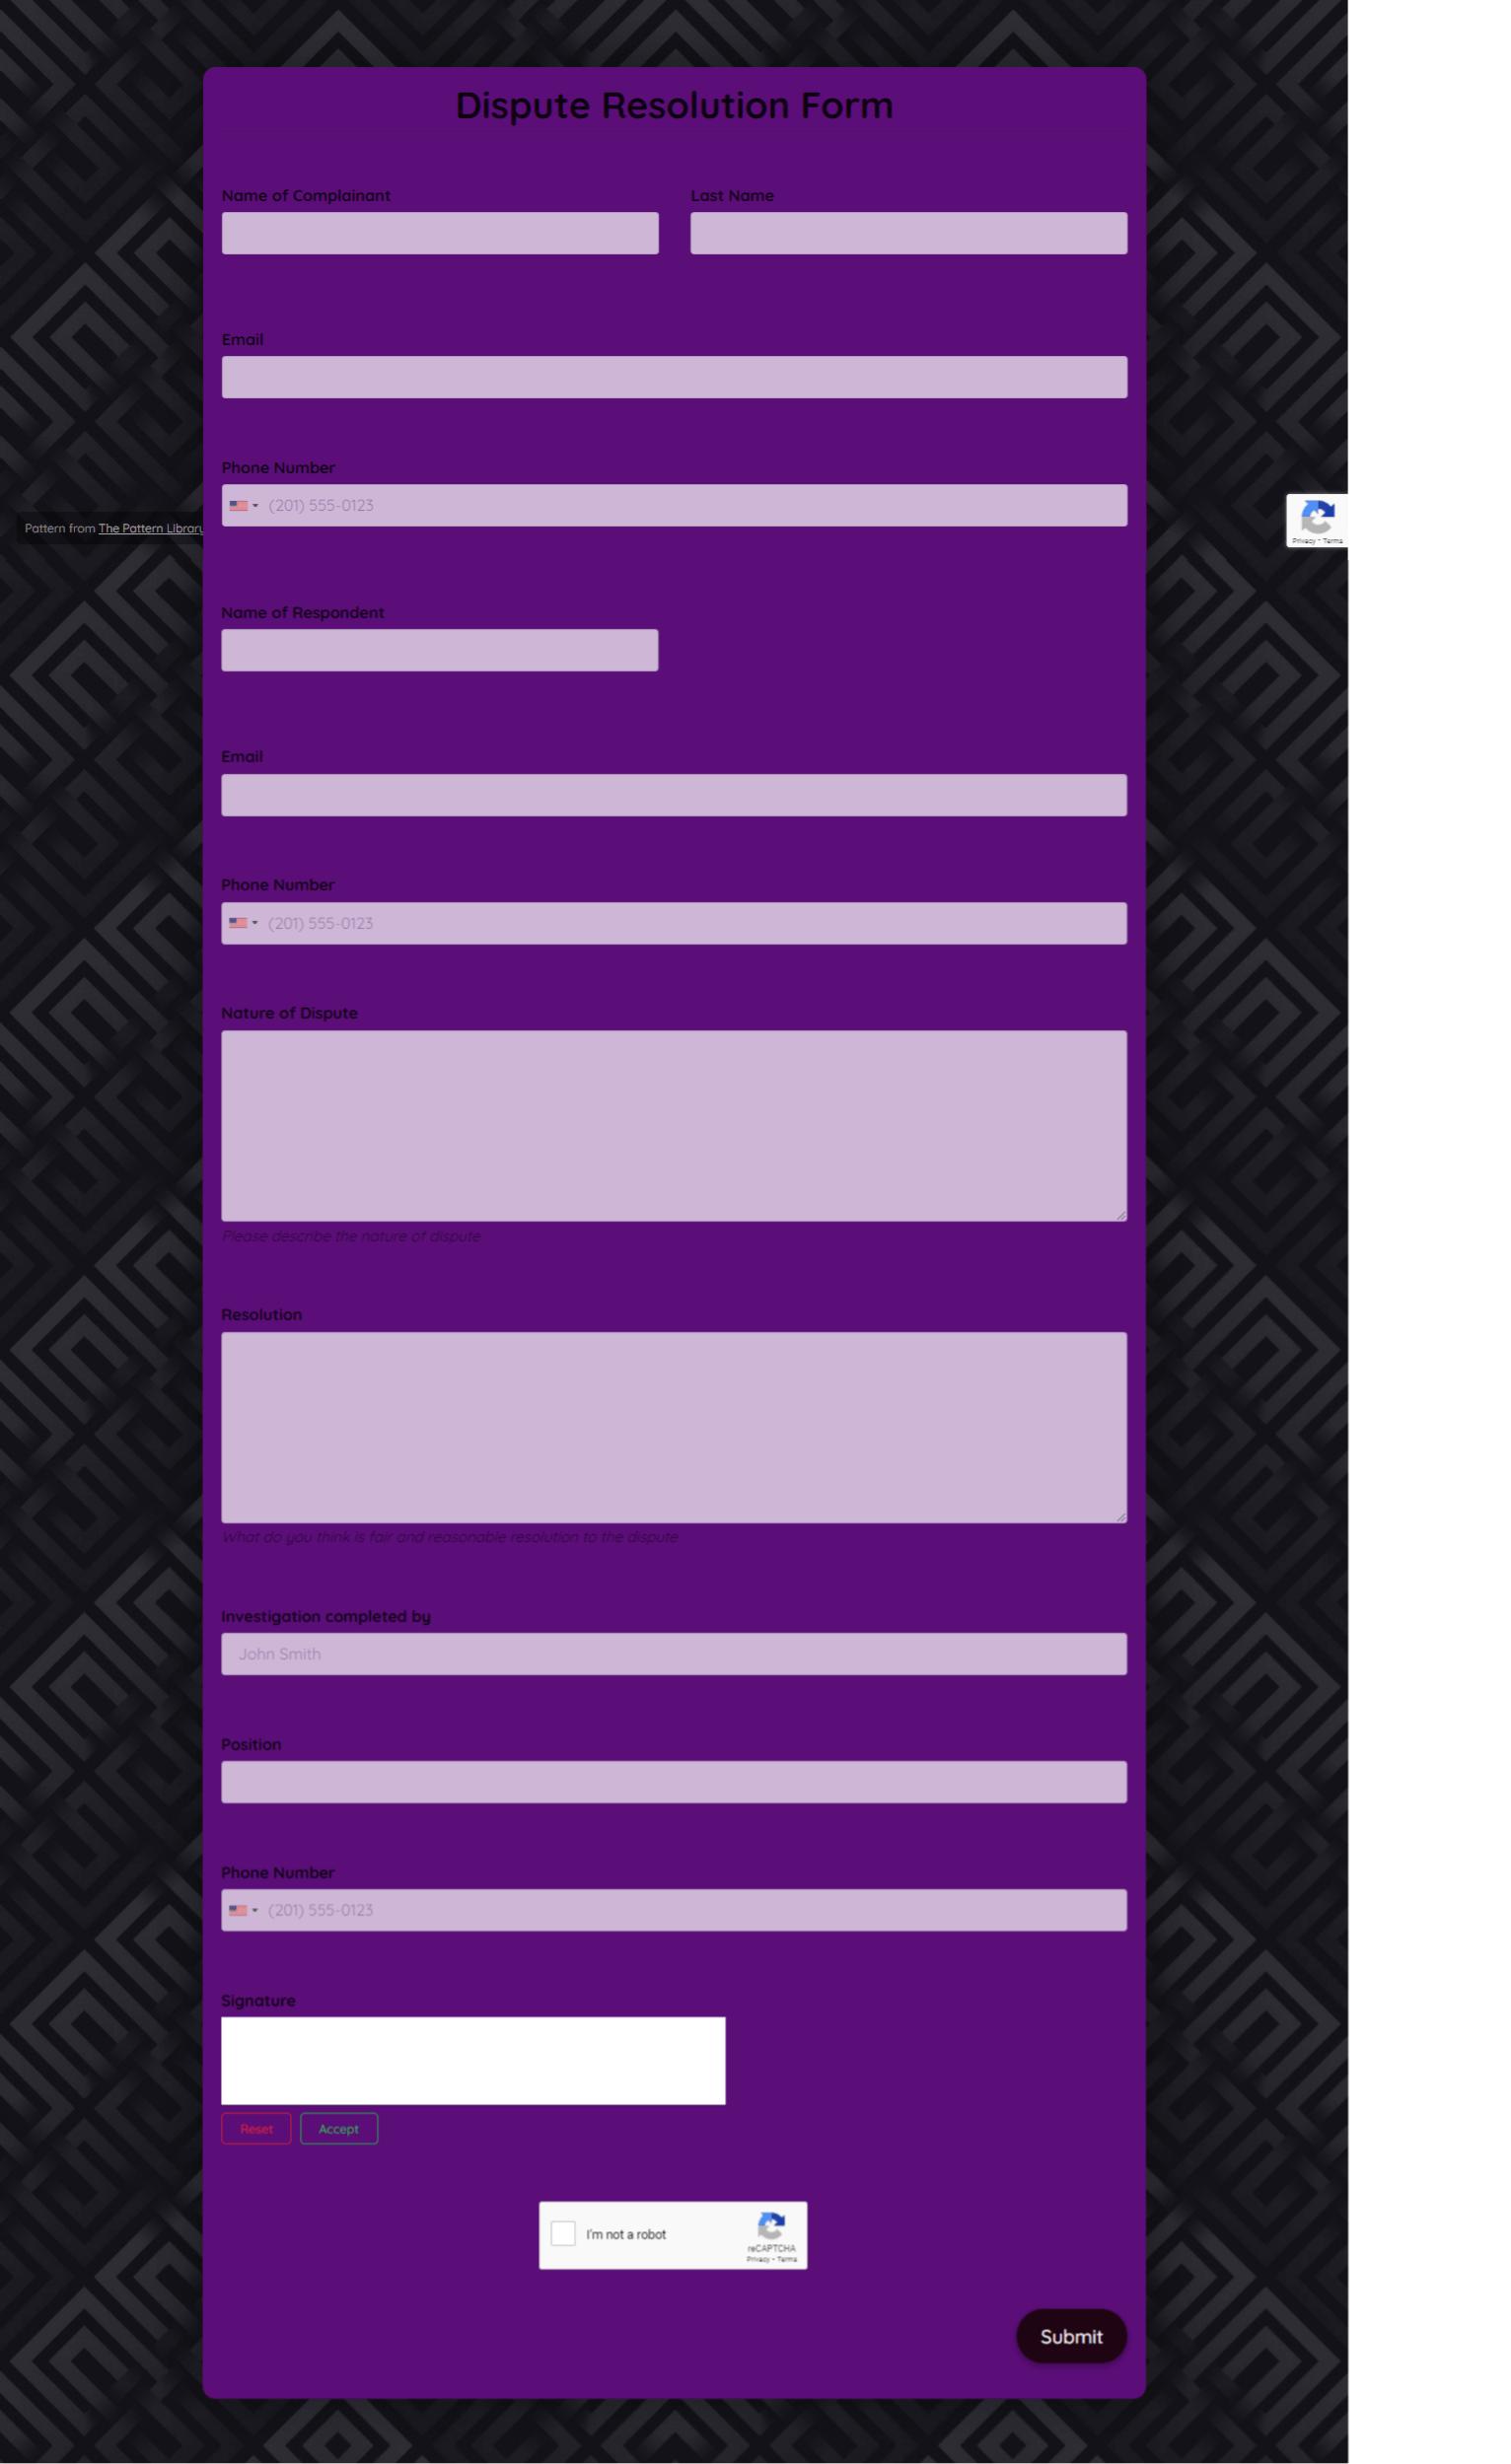 Dispute Resolution Form Template template